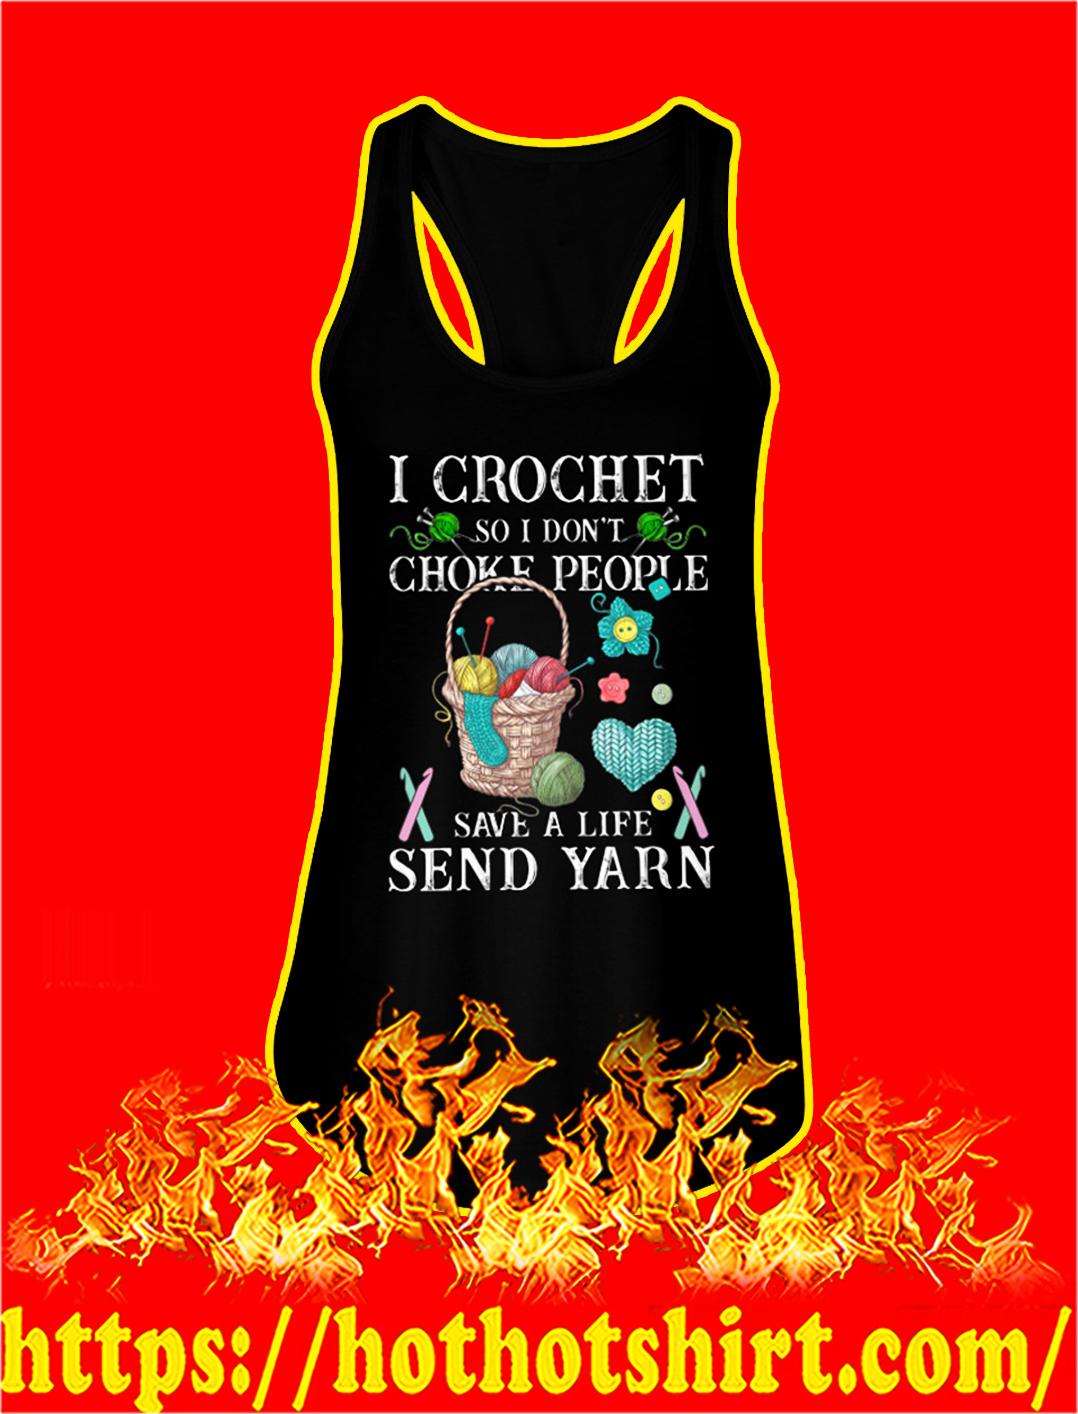 I crochet so I don't choke people save a life send yarn tank top